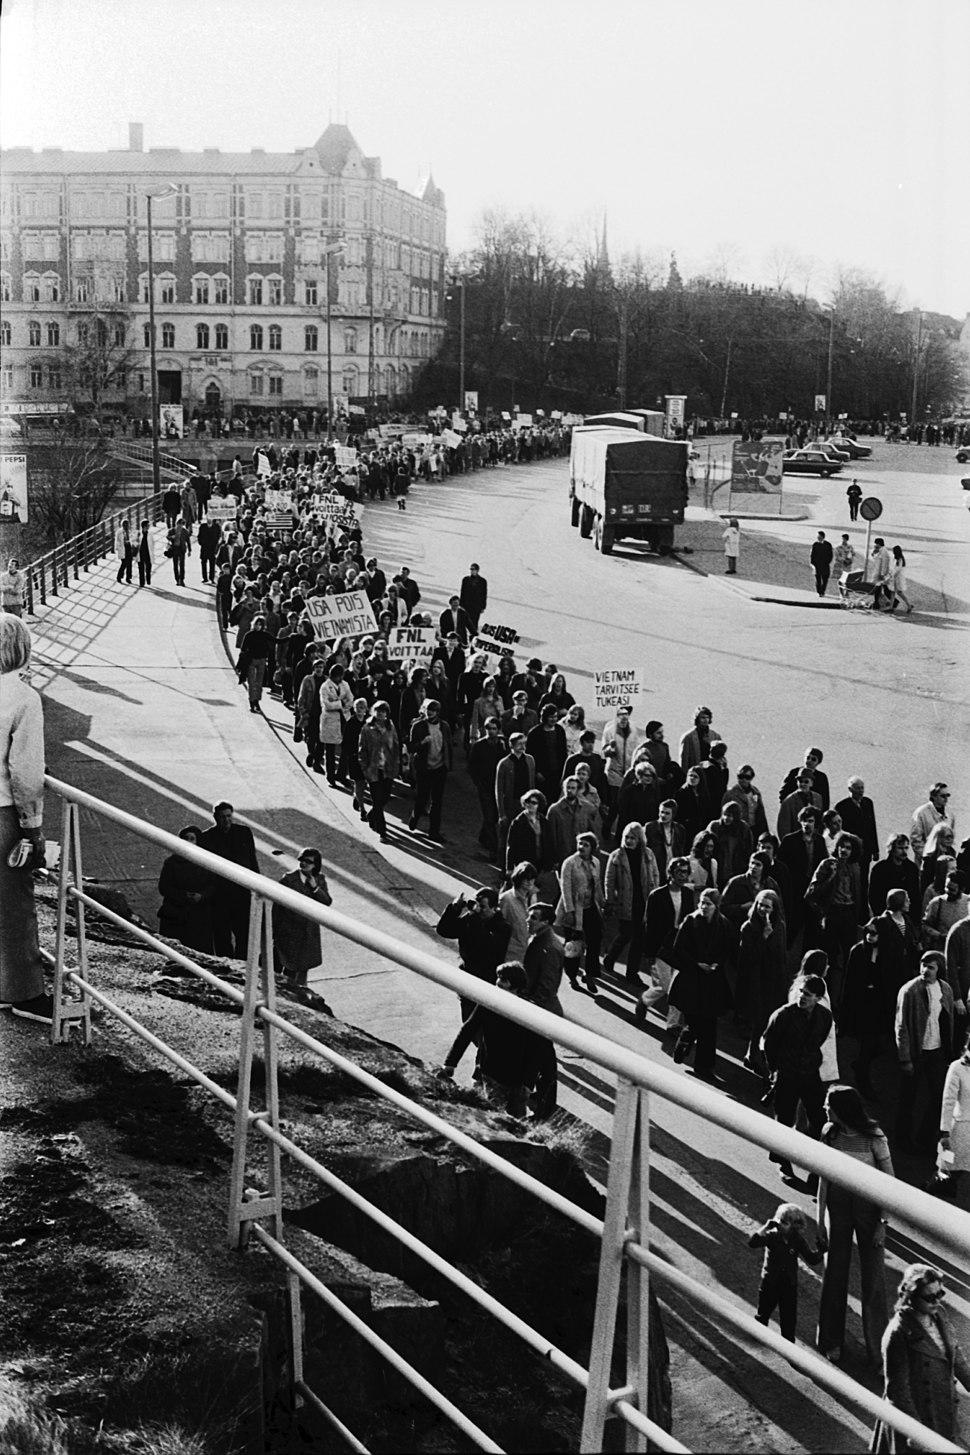 Vietnam-protest-1970-Helsinki